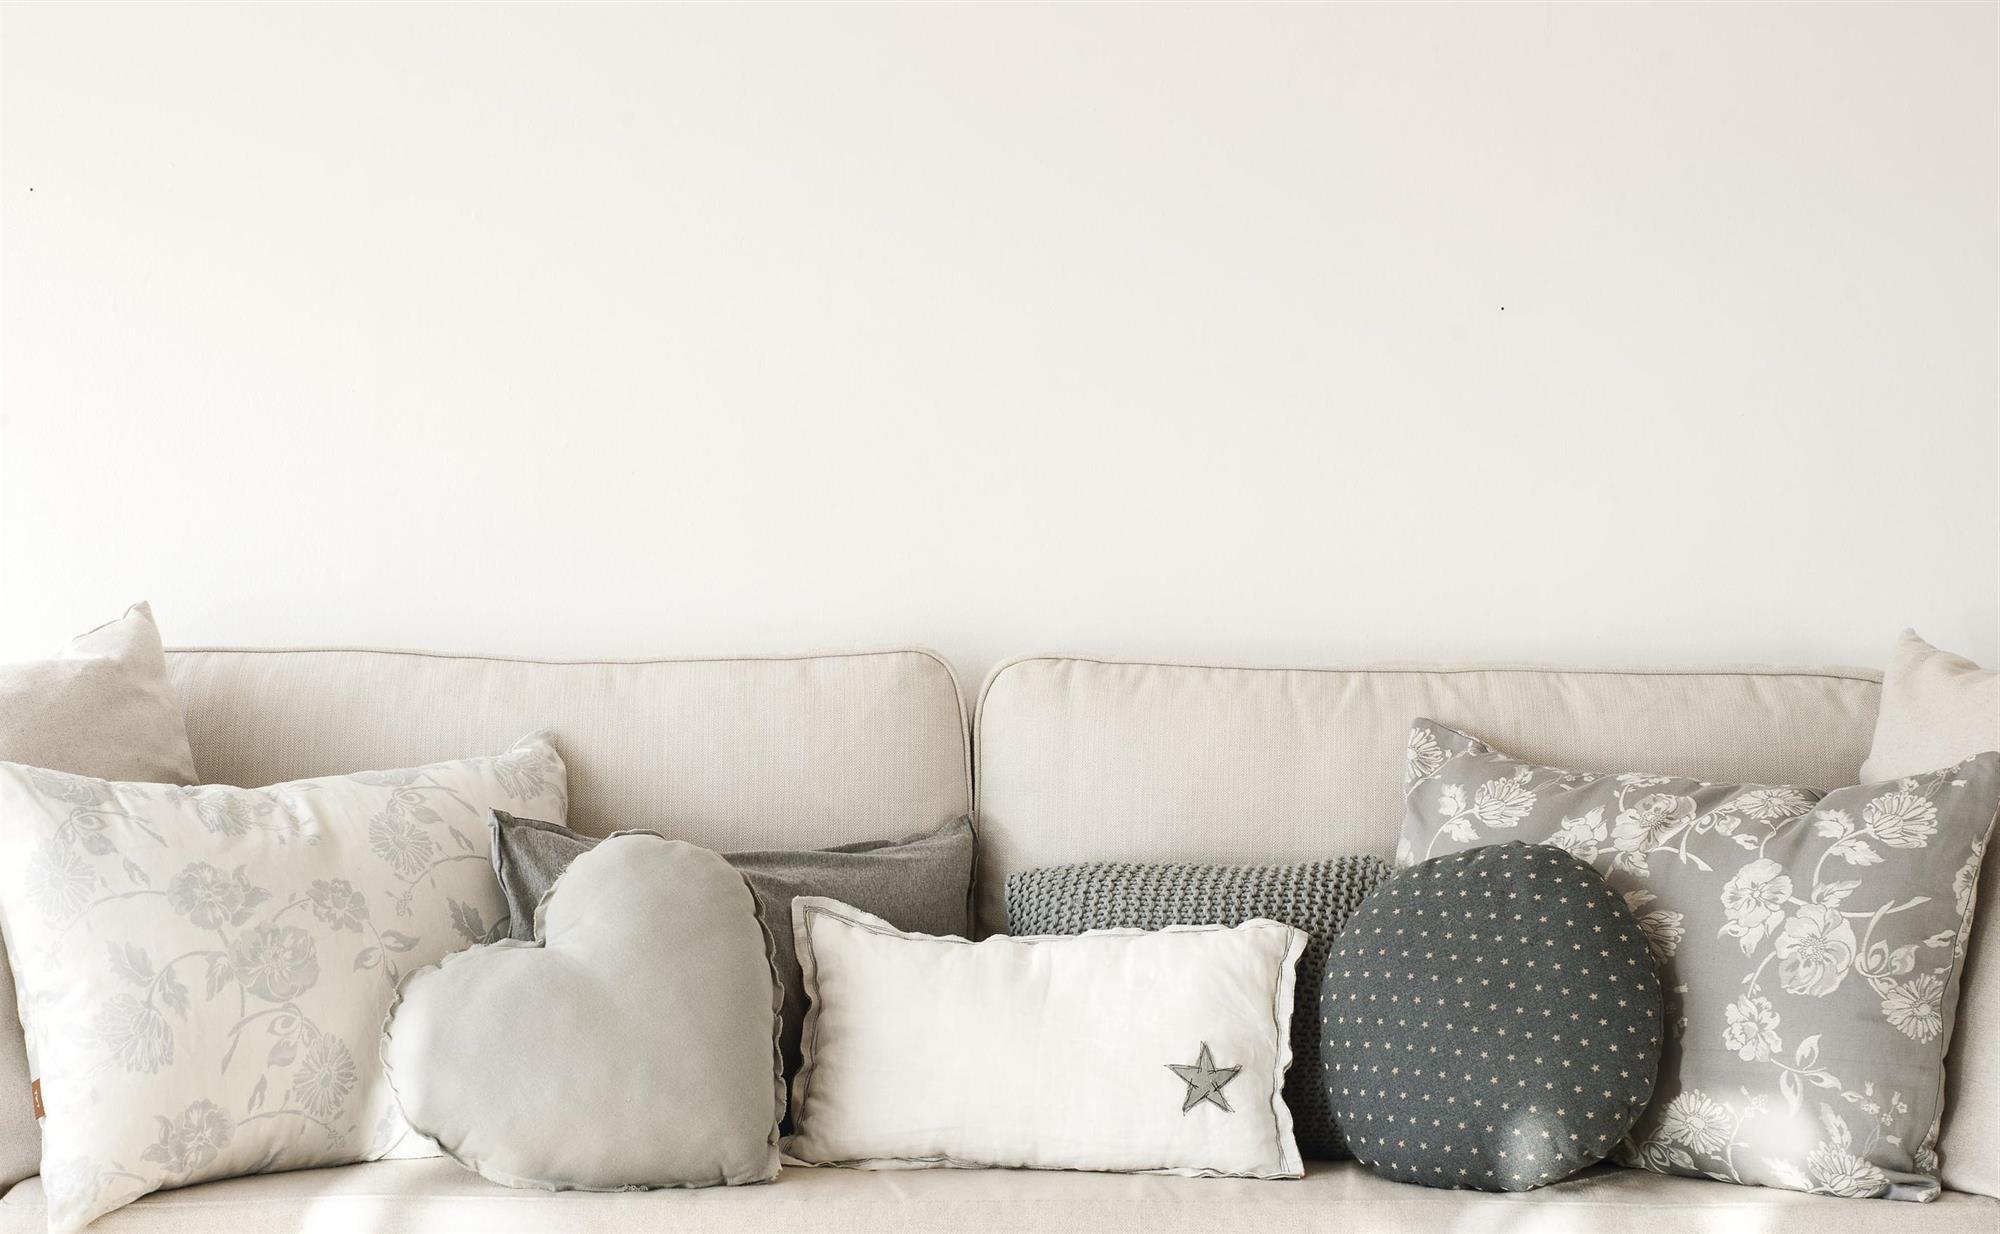 Mantas De sofa Zara Home Txdf Mantas Cama Zara Home à Nico Cojines sofa Zara Home Galera De DiseO